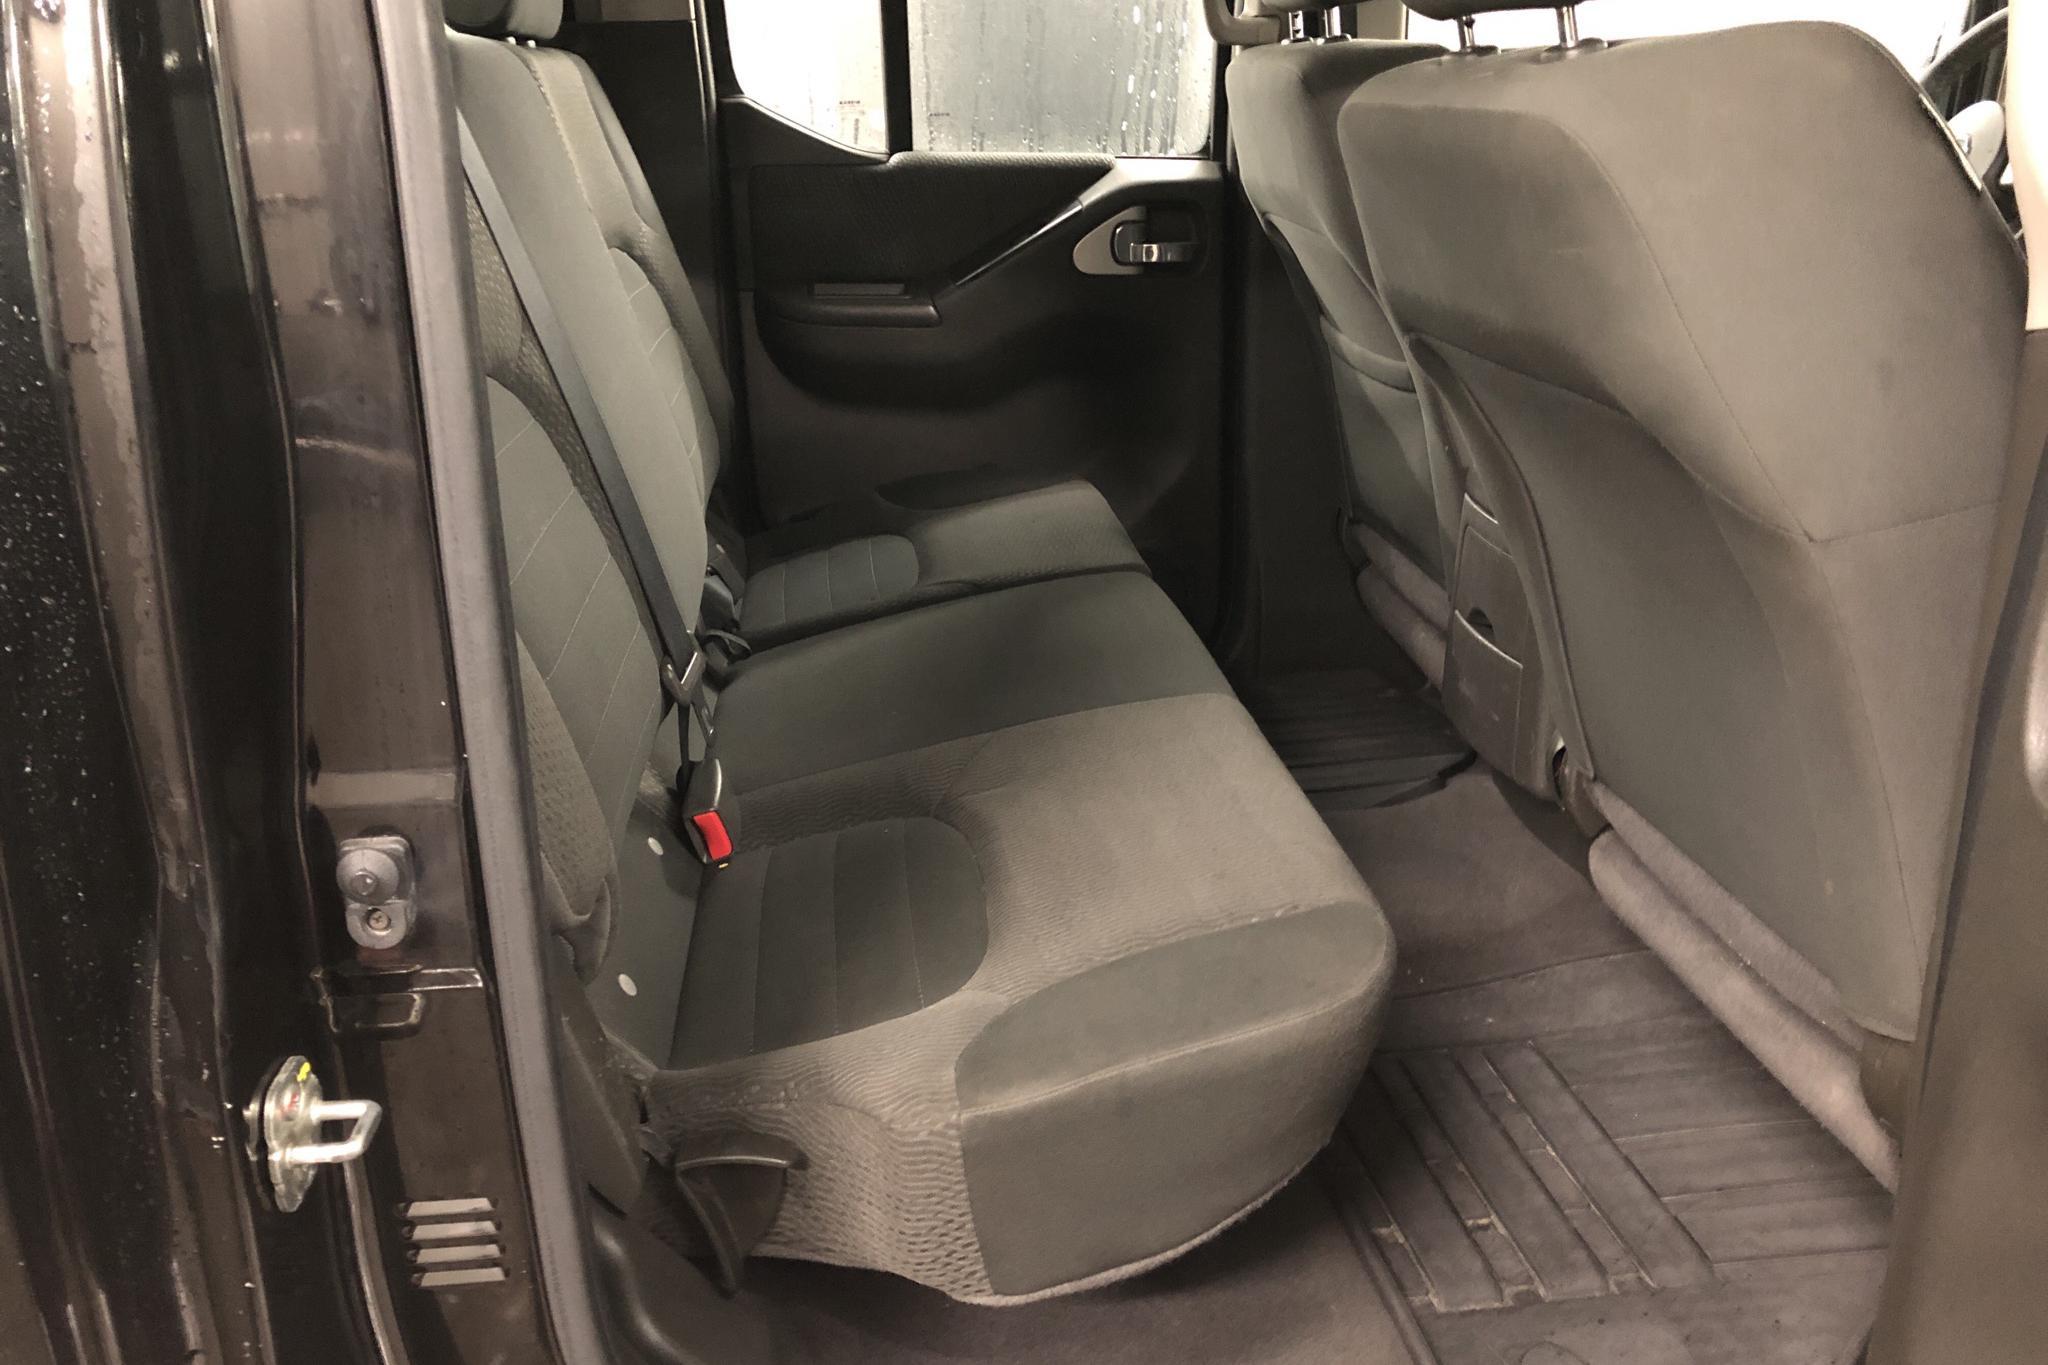 Nissan Navara 2.5 dCi (190hk) - 187 600 km - Manual - black - 2011